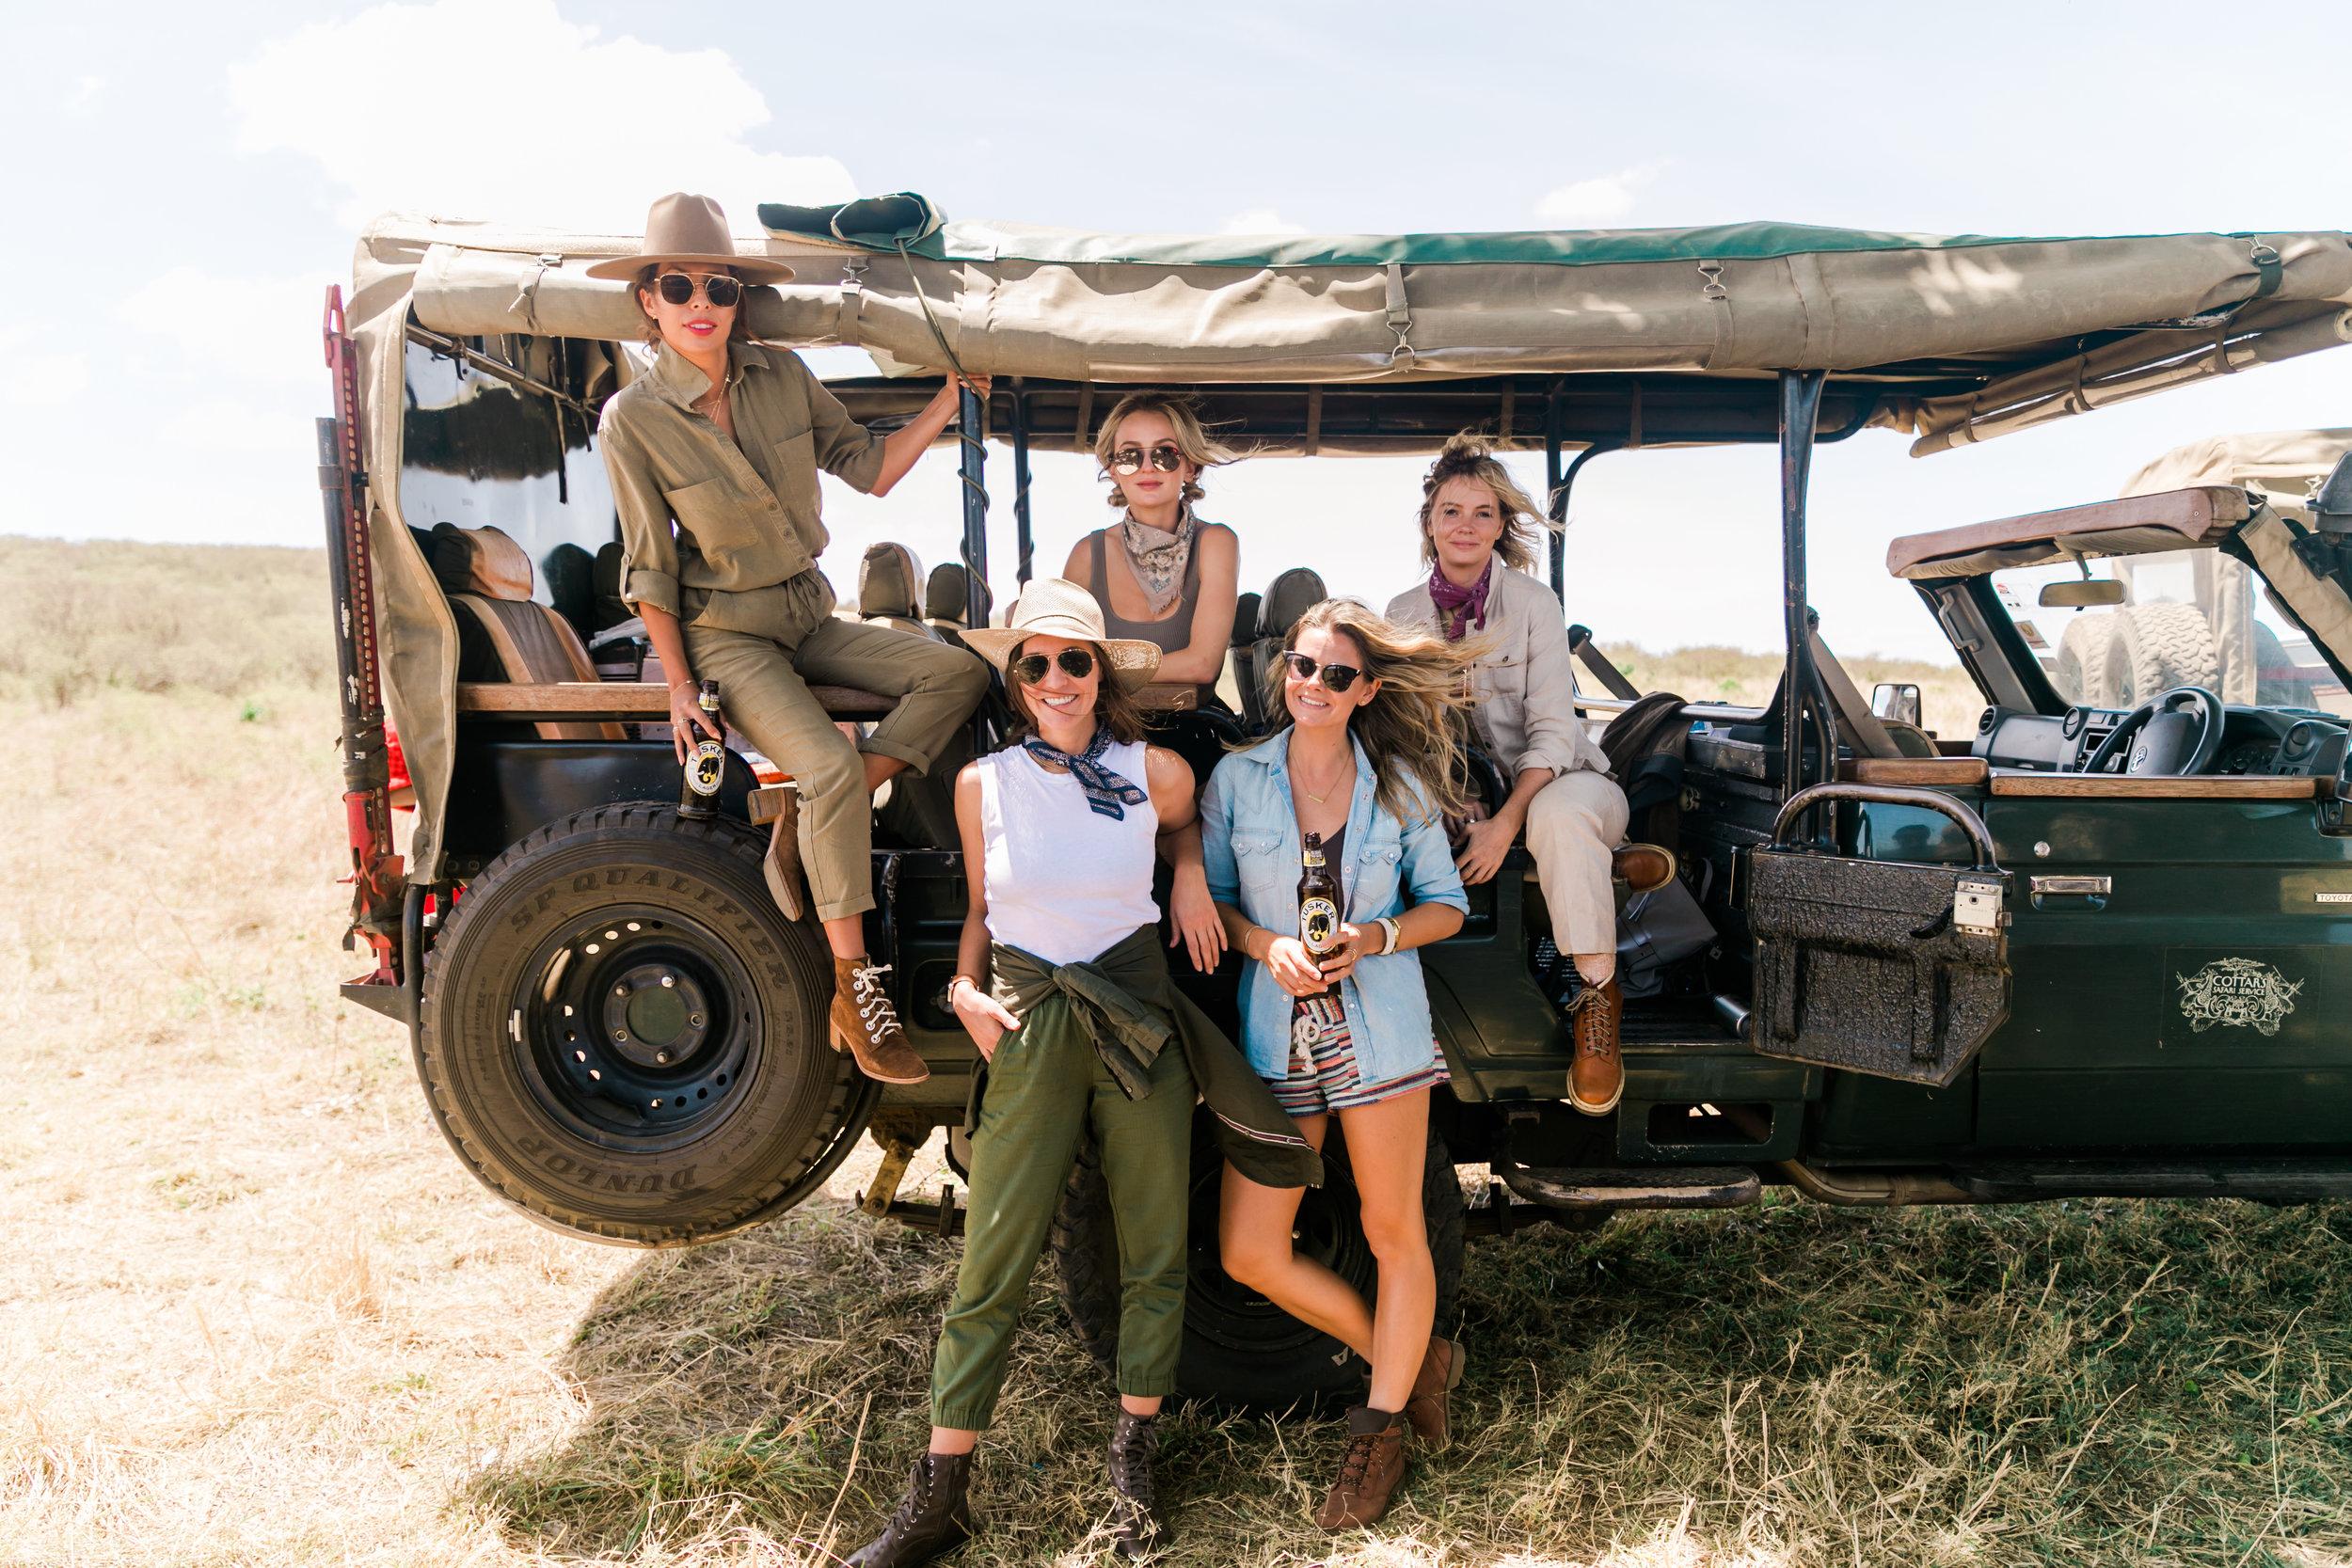 Safari but make it fashion! Ph. Valorie Darling